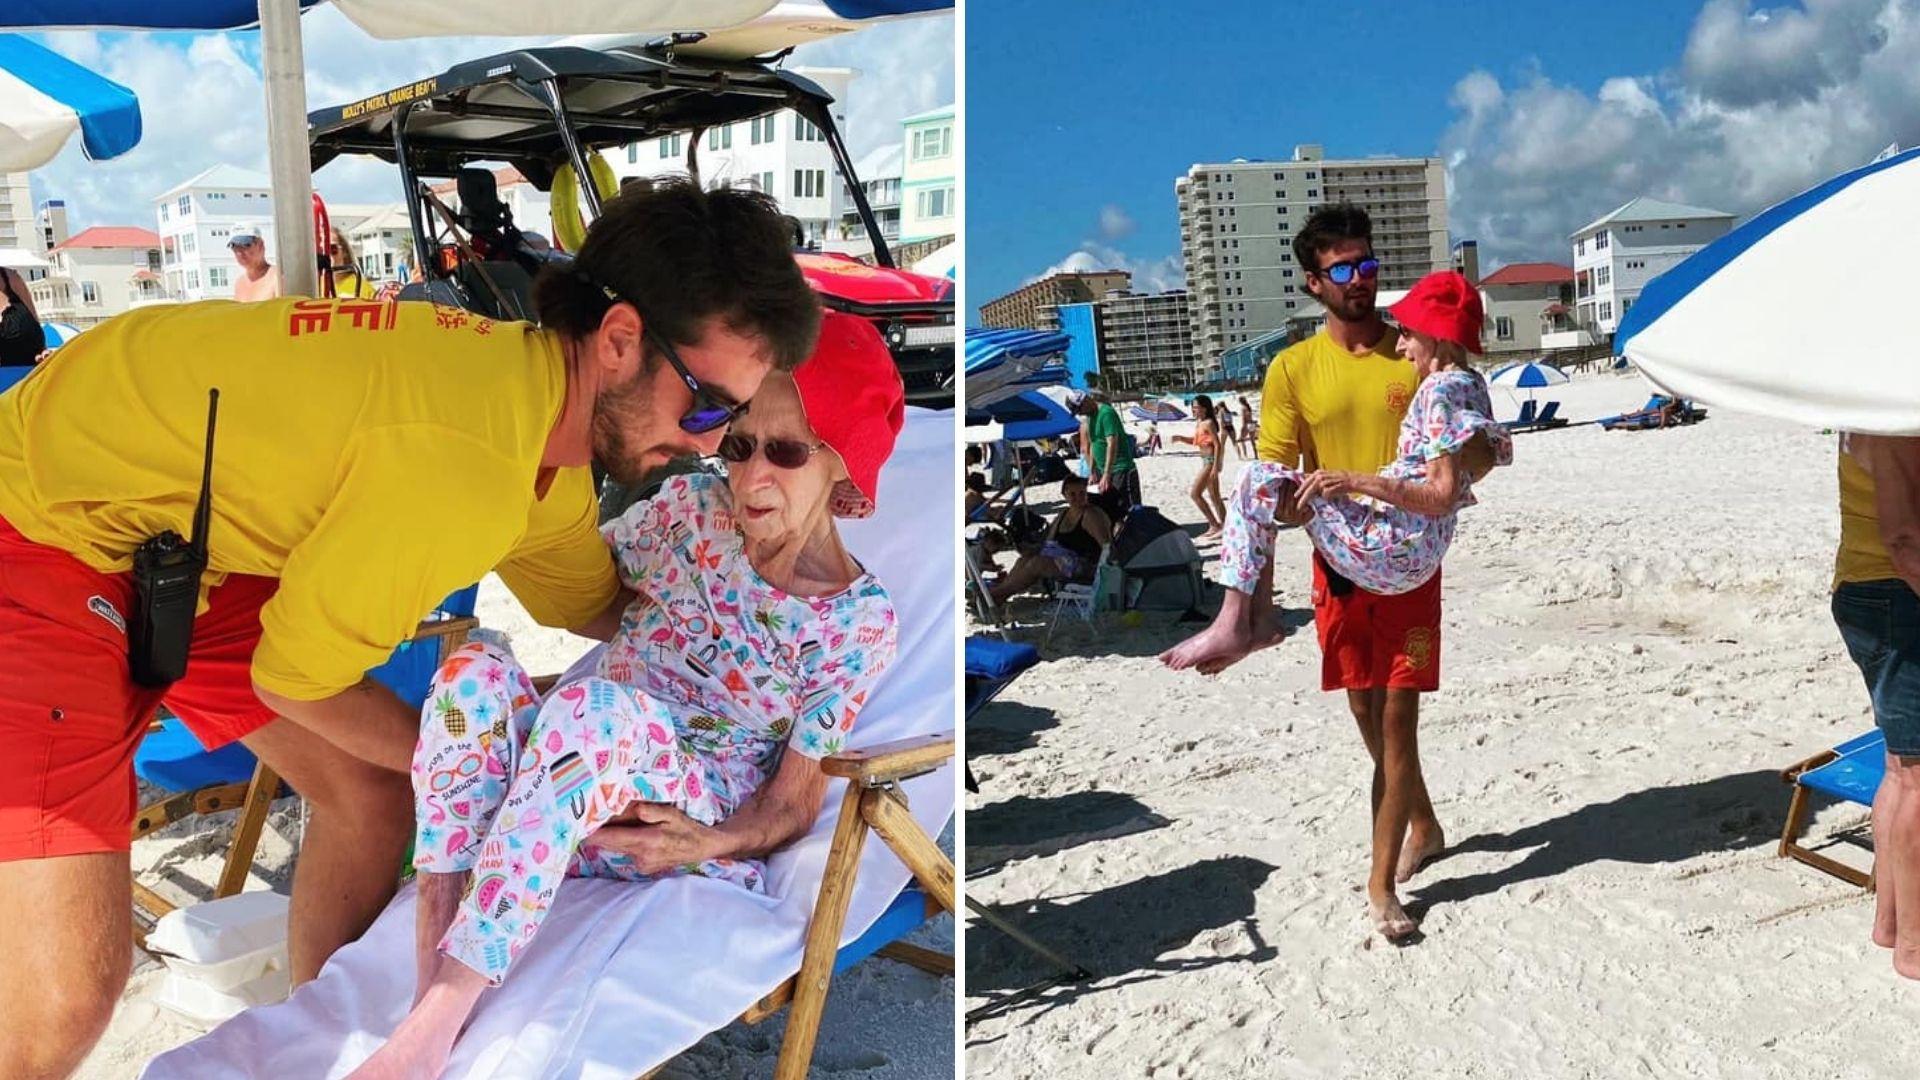 Alabama lifeguards, Dottie Schneider